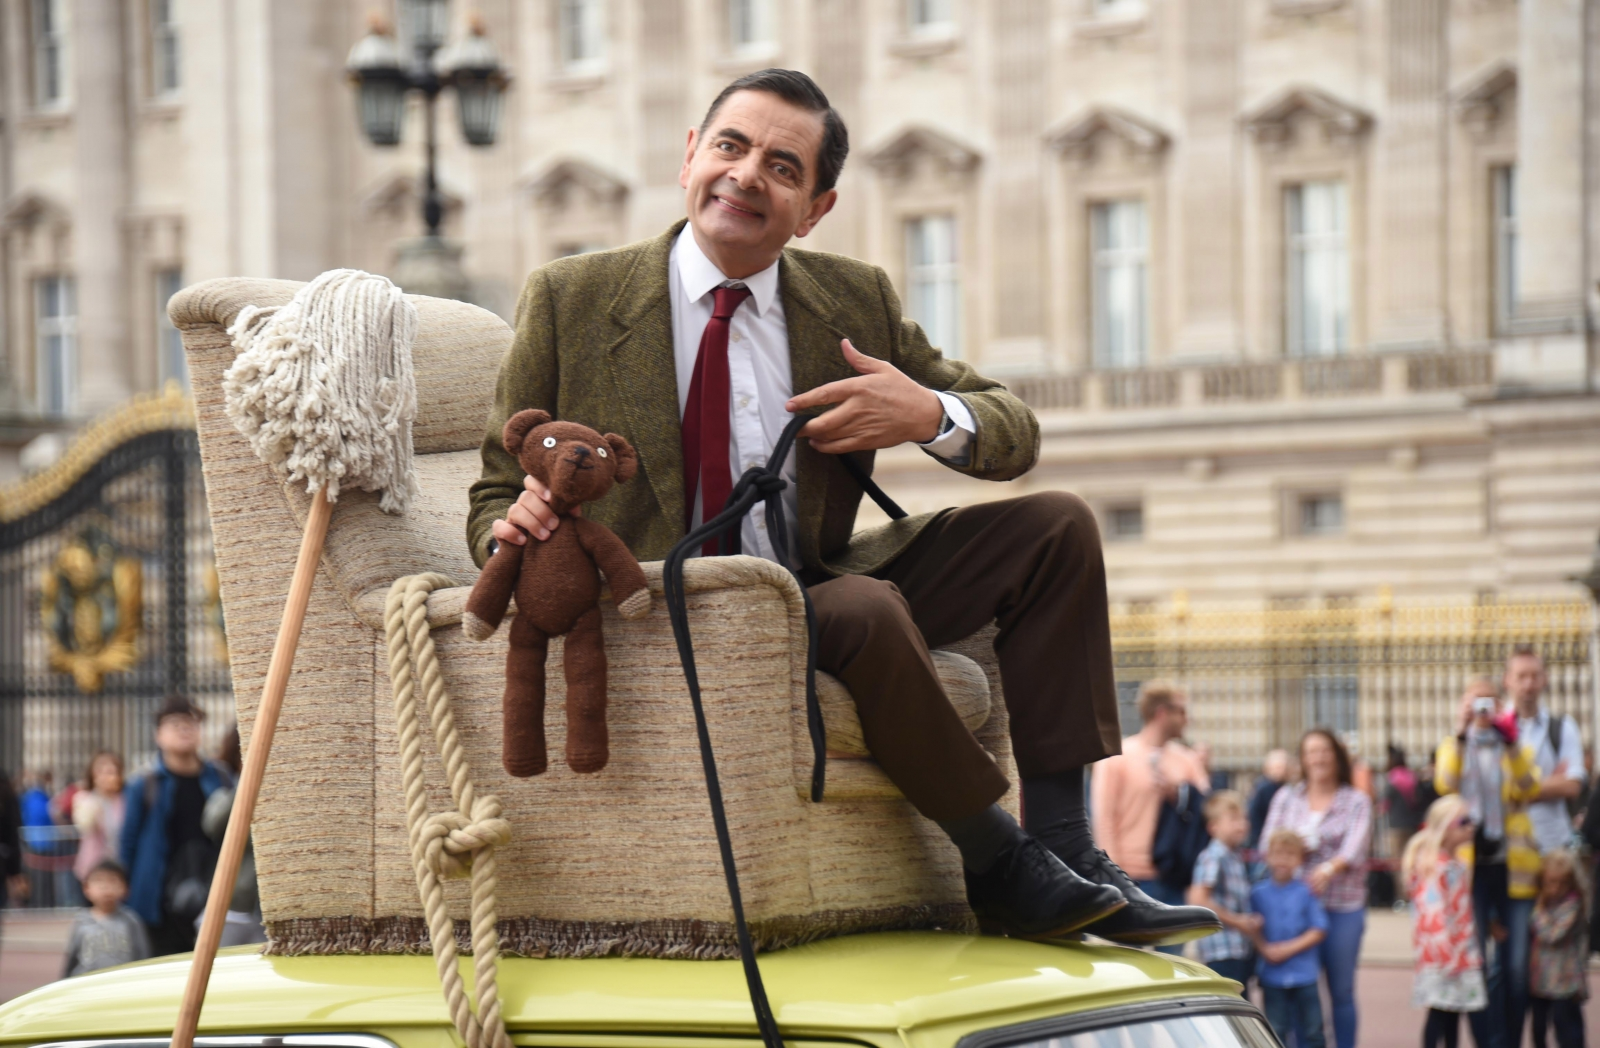 Mr. Bean celebrates 25th anniversary in London